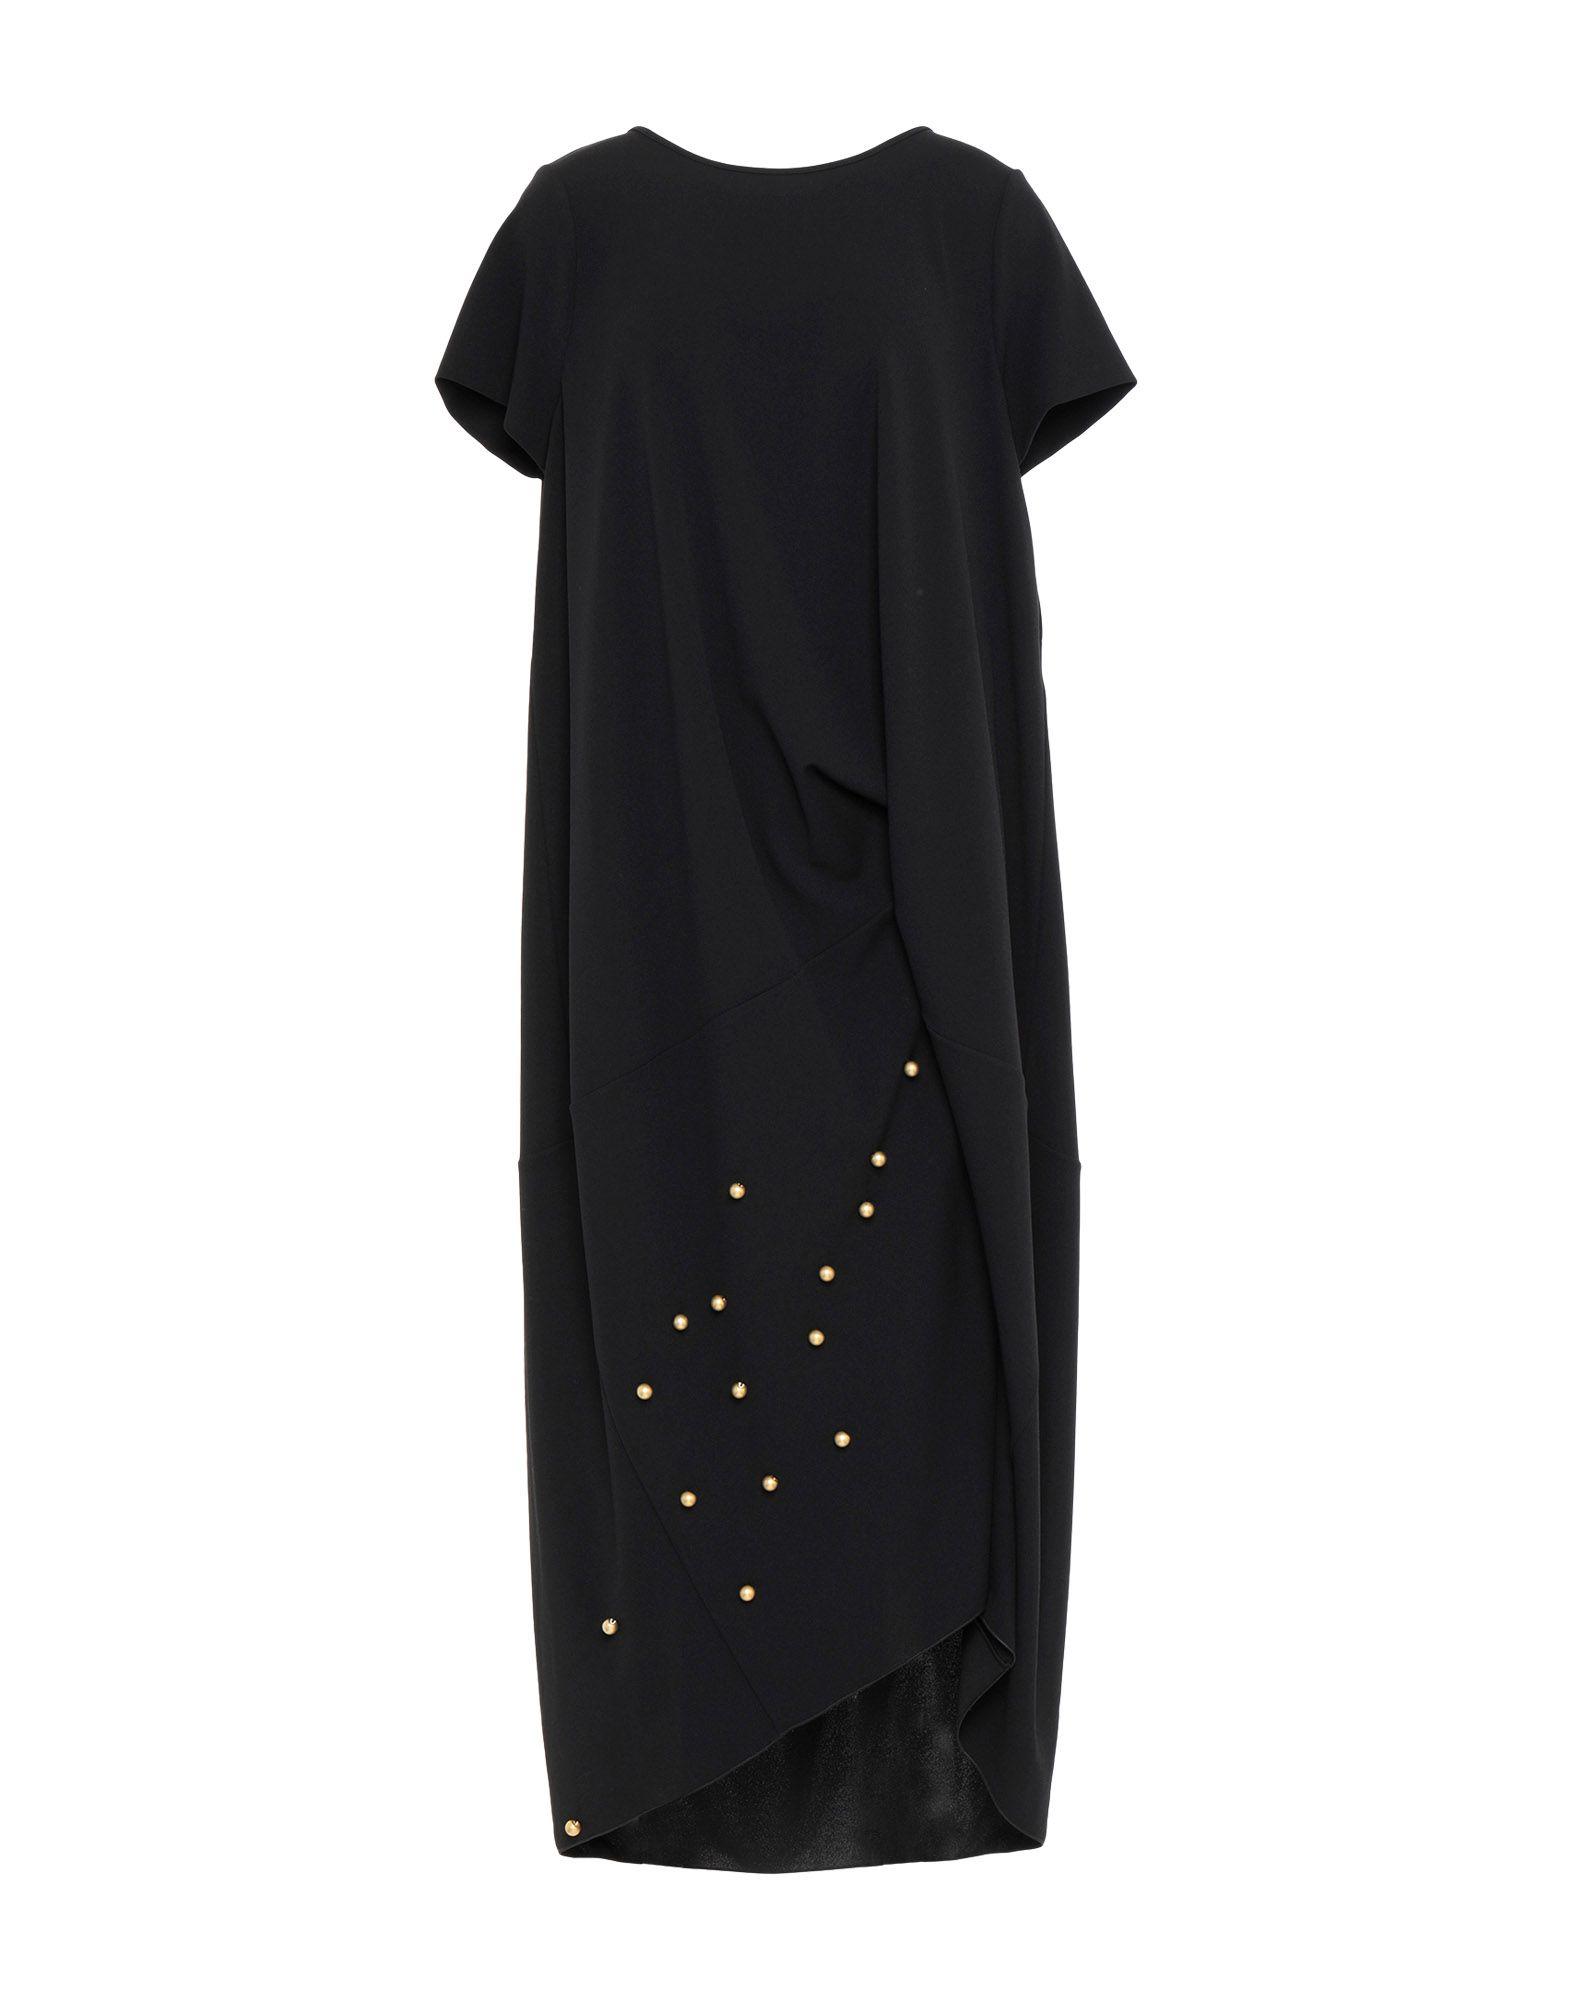 MARIA CALDERARA Платье длиной 3/4 stainless steel black bathroom ultrathin 2 mm rain shower head 8 10 12 inch wall